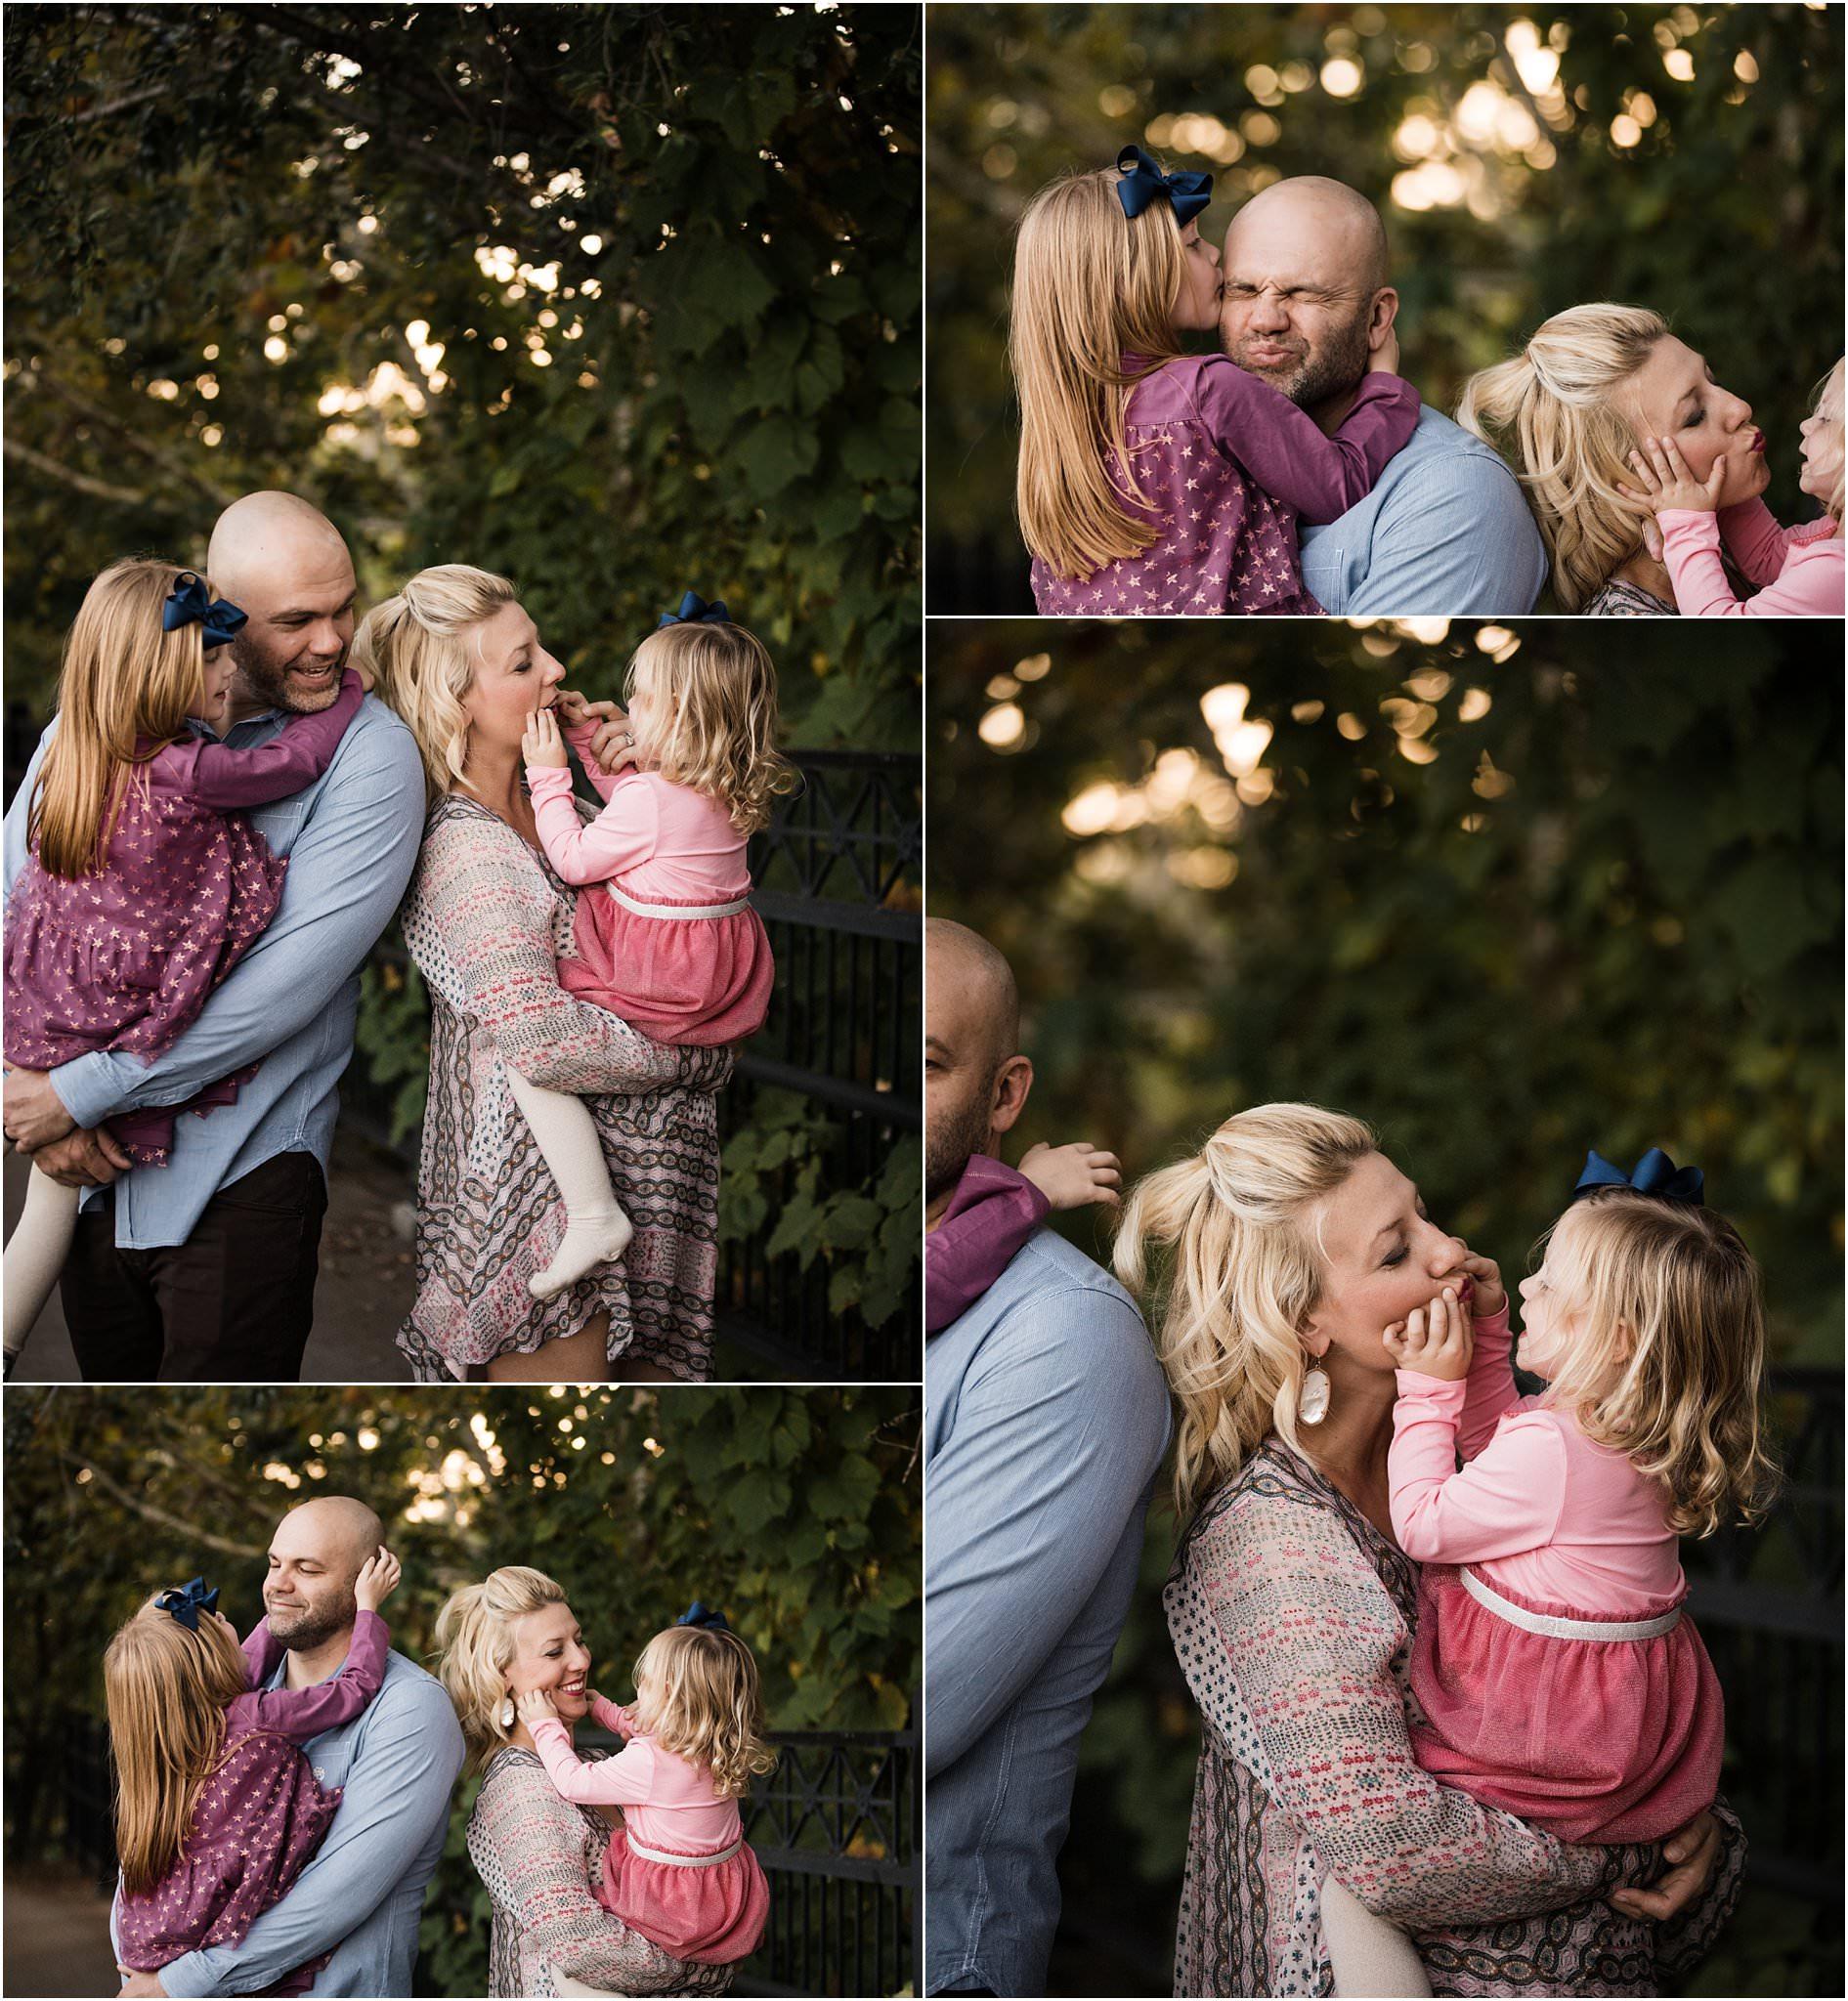 lifestyle family photos at washington's landing